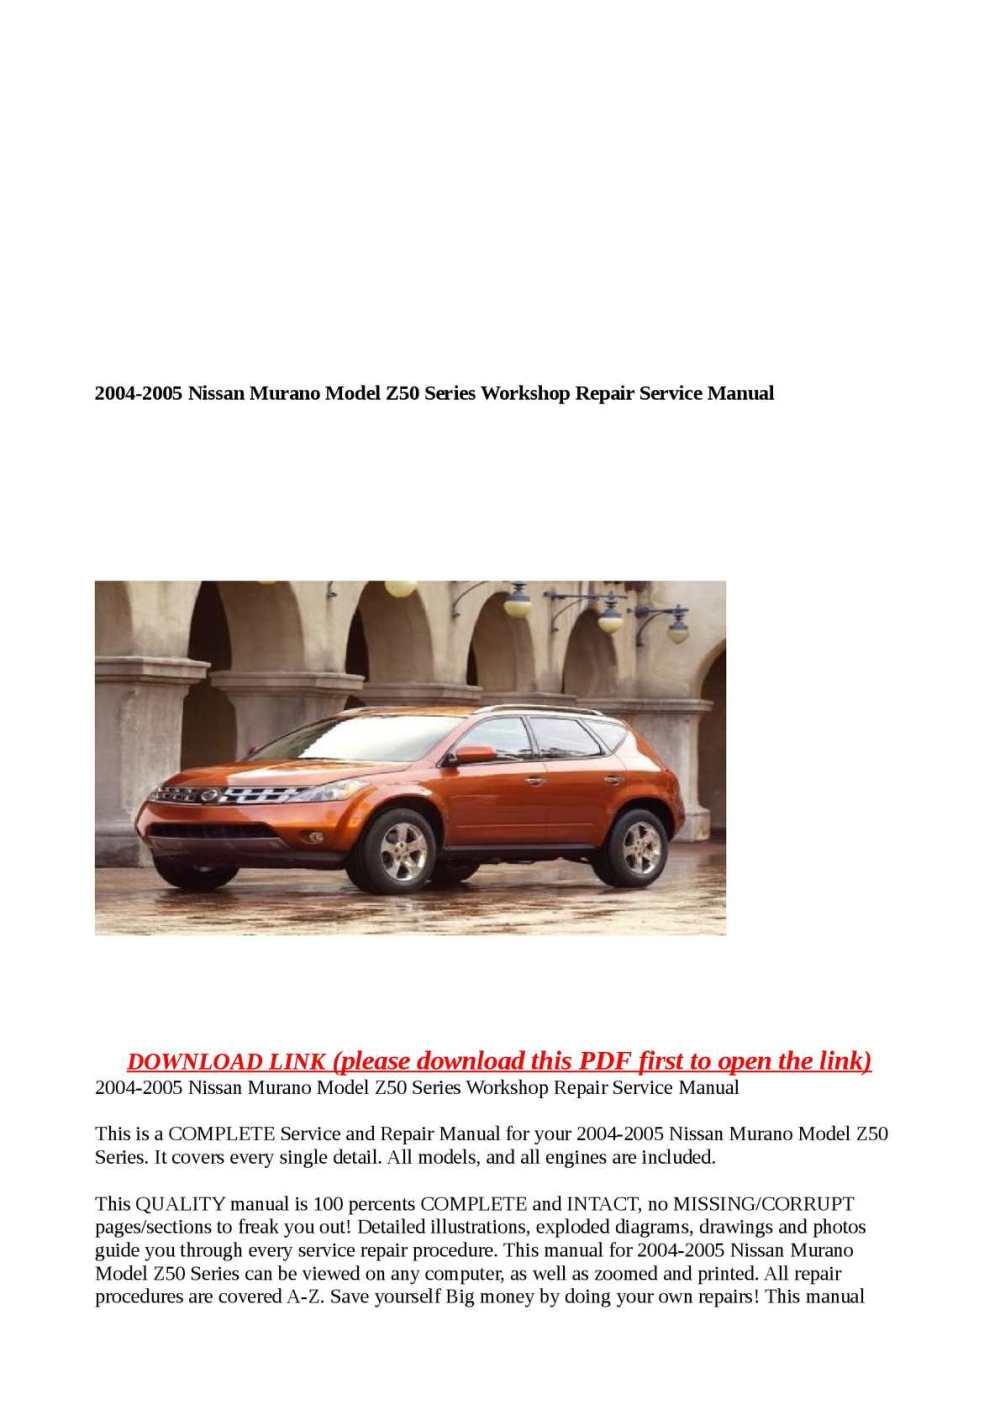 medium resolution of 2004 2005 nissan murano model z50 series workshop repair service